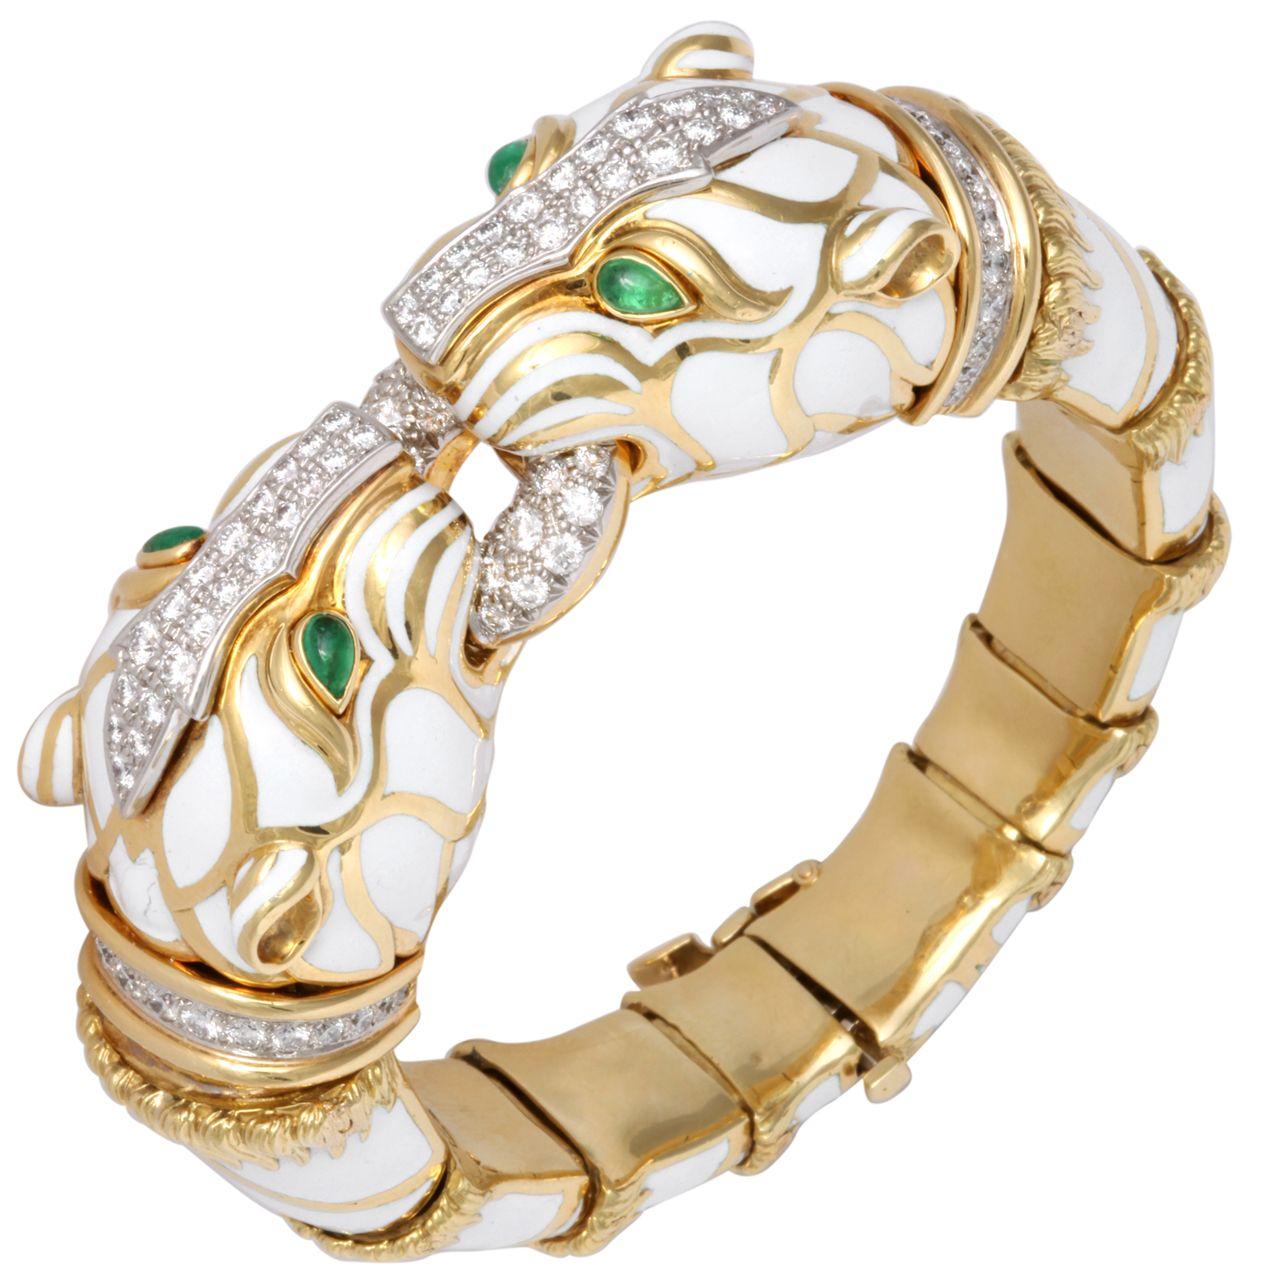 30+ David webb jewelry for sale viral